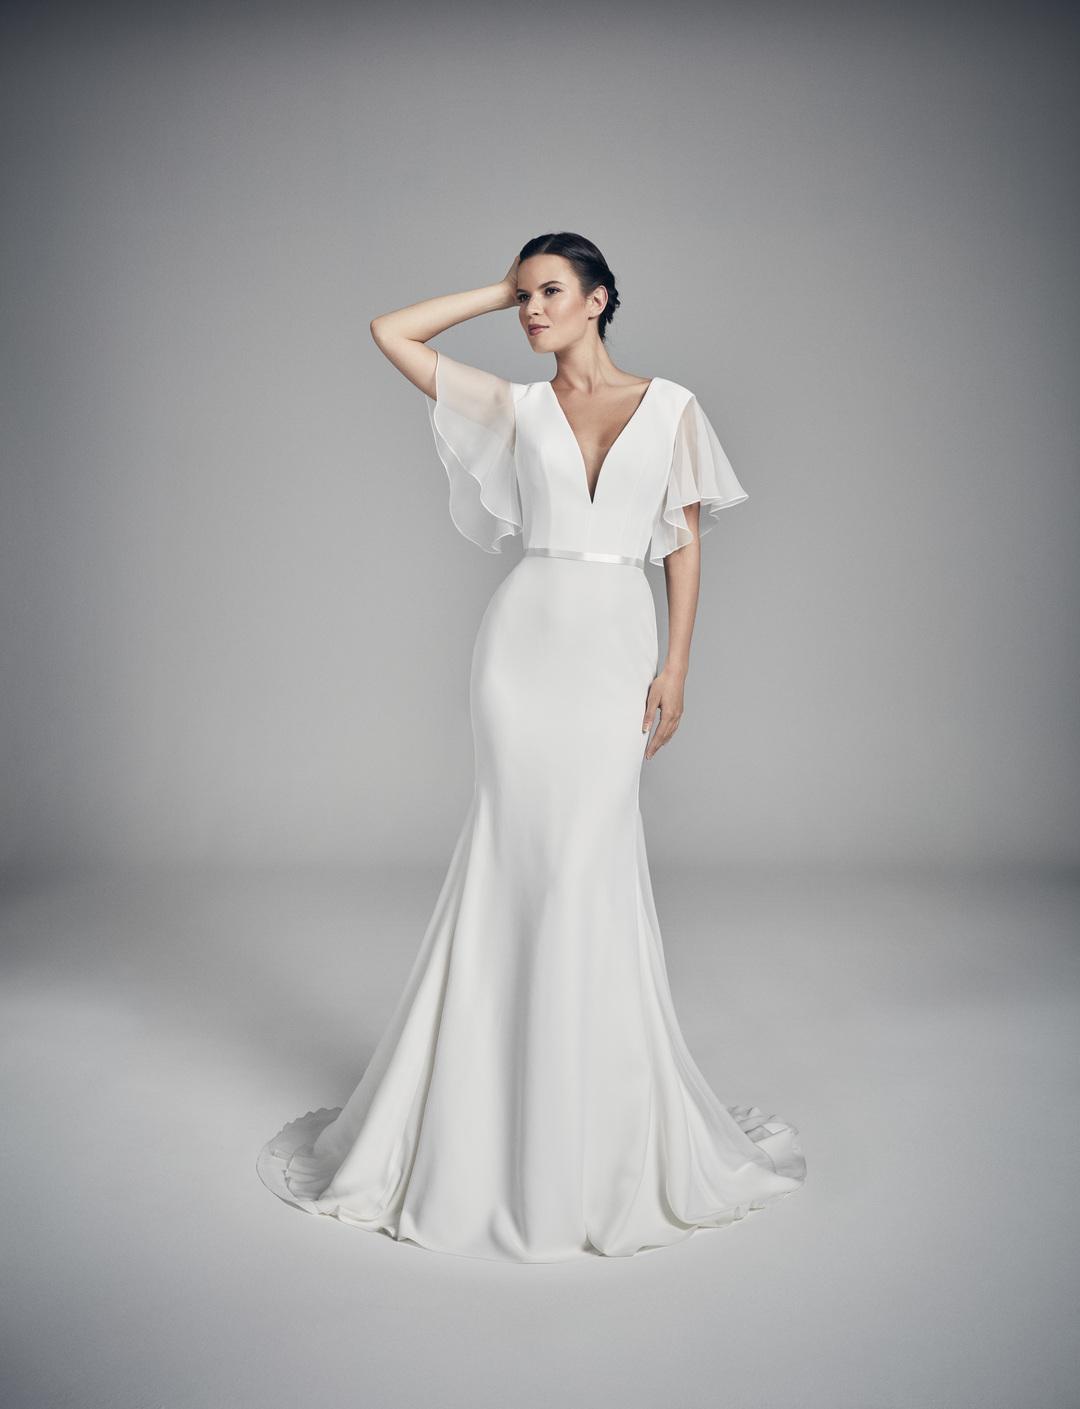 ariel dress photo